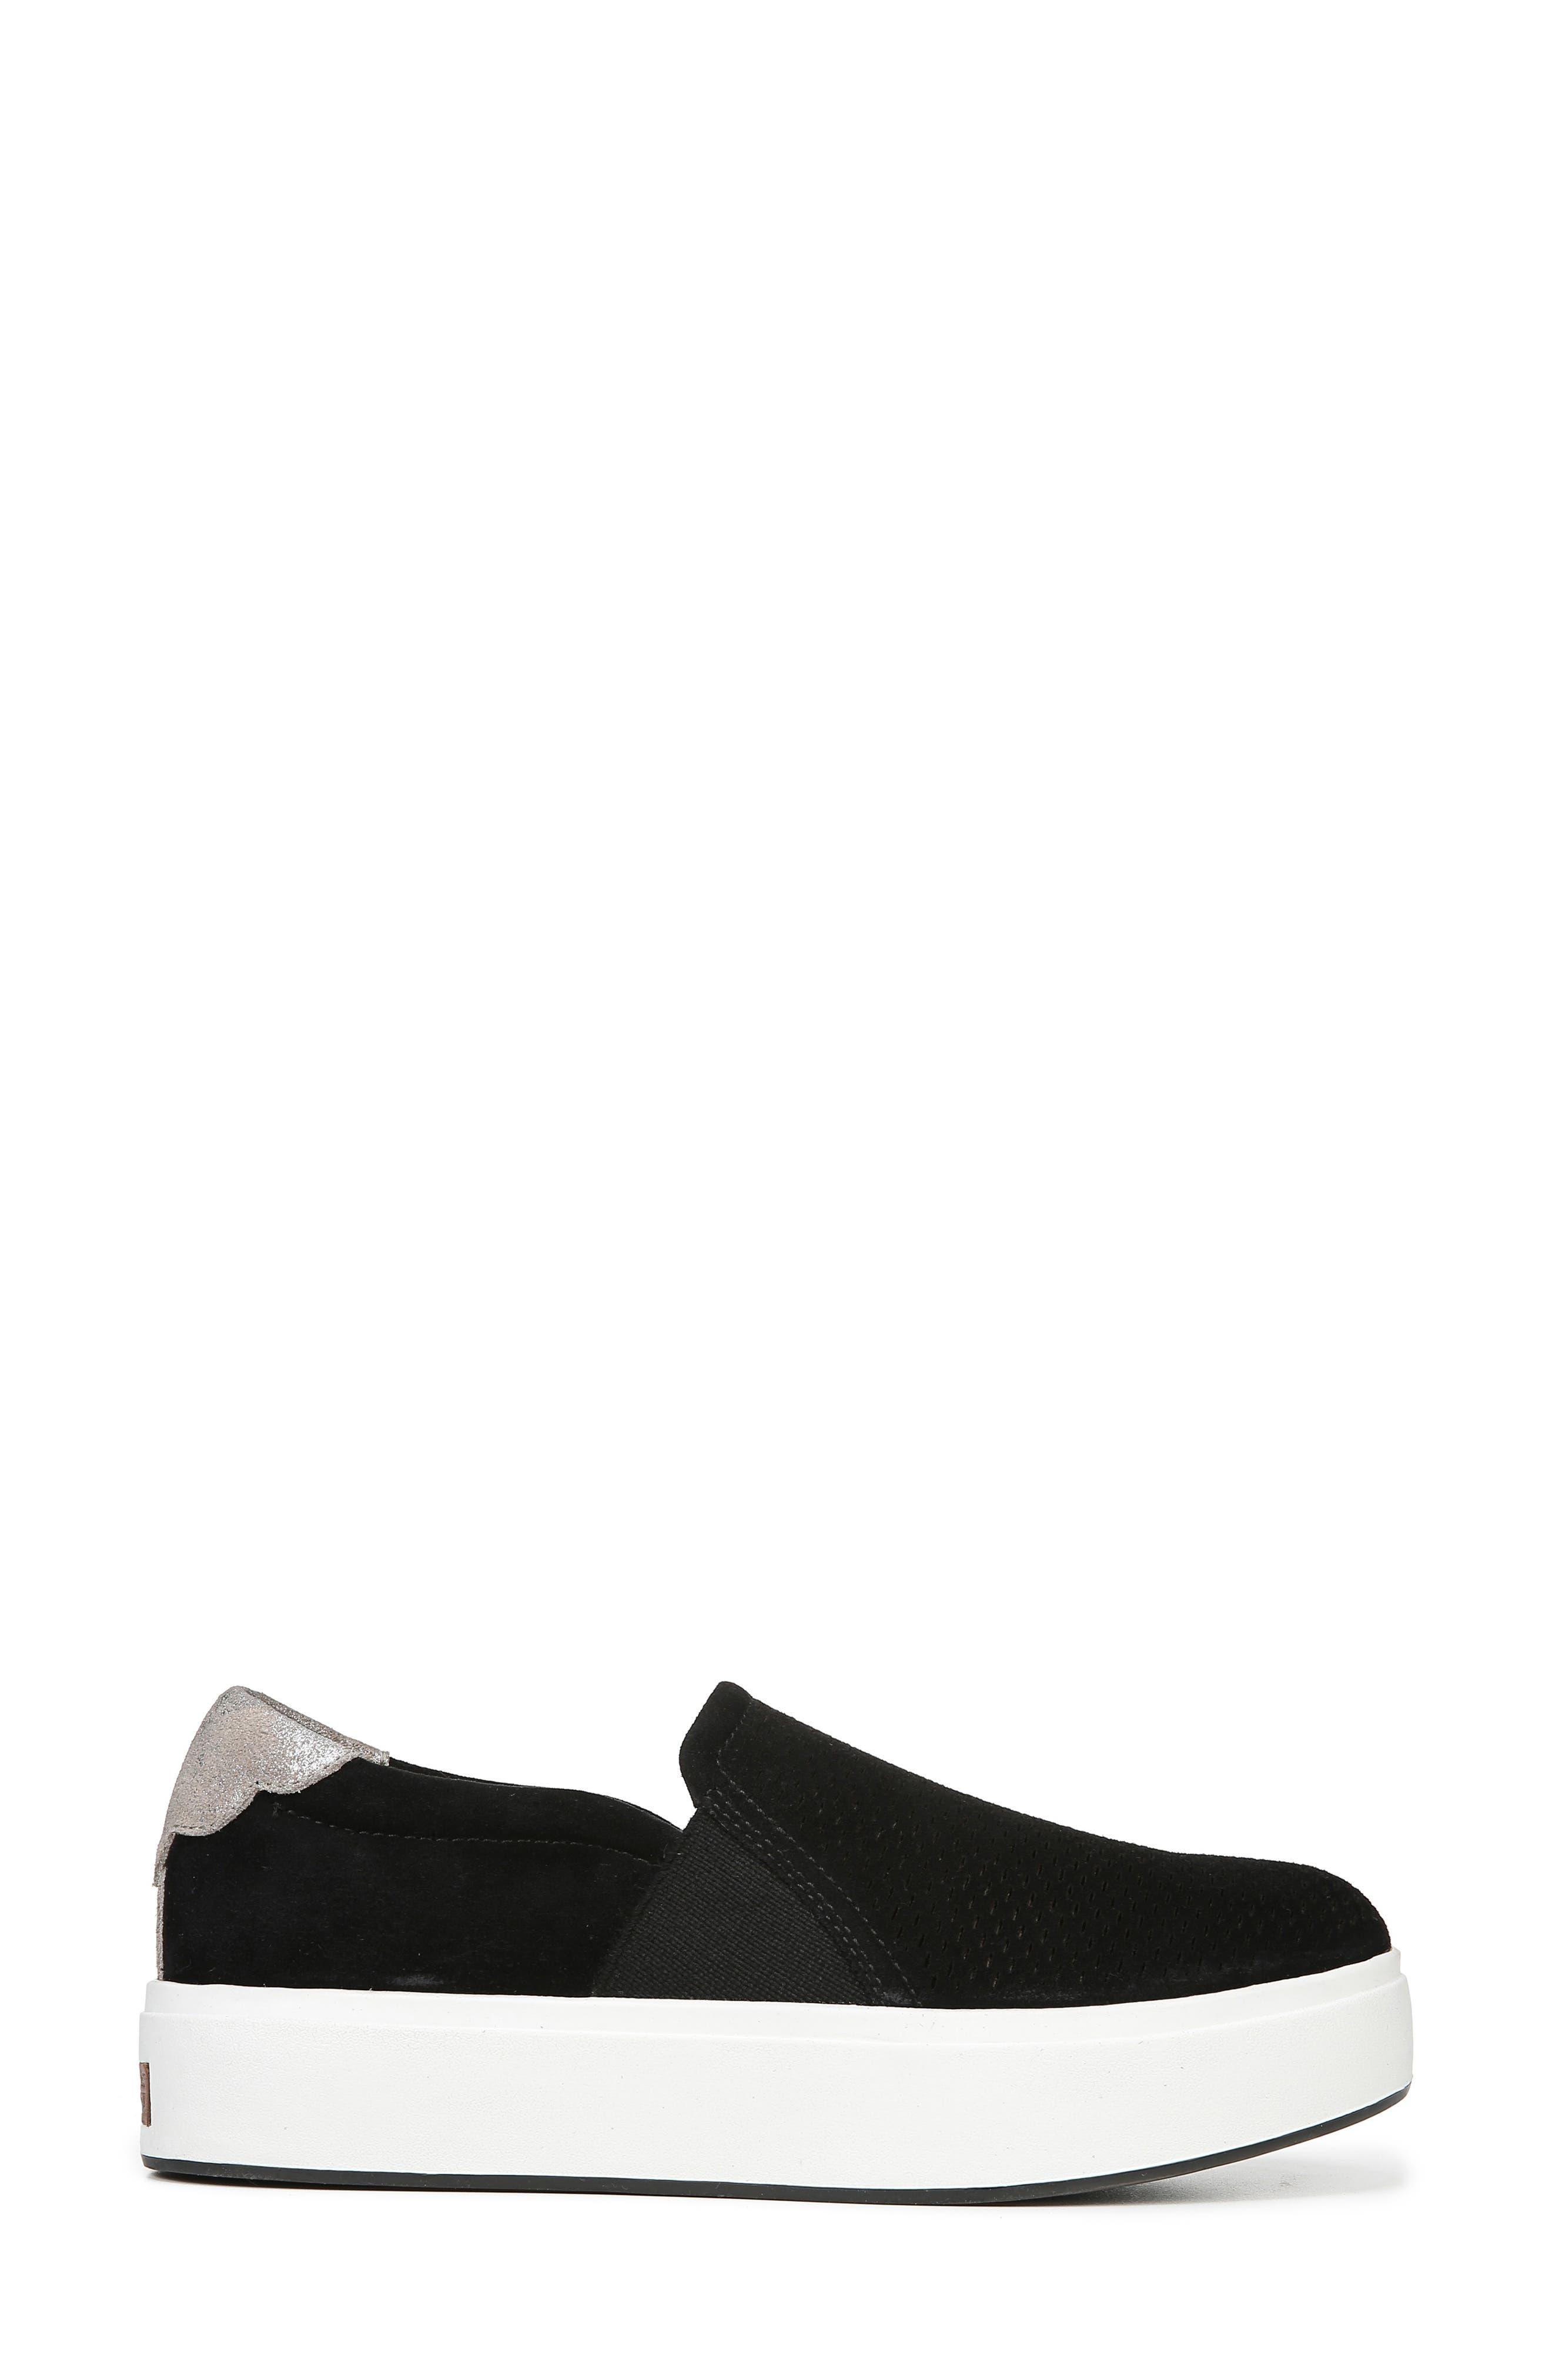 Abbot Lux Sneaker,                             Alternate thumbnail 3, color,                             BLACK SUEDE